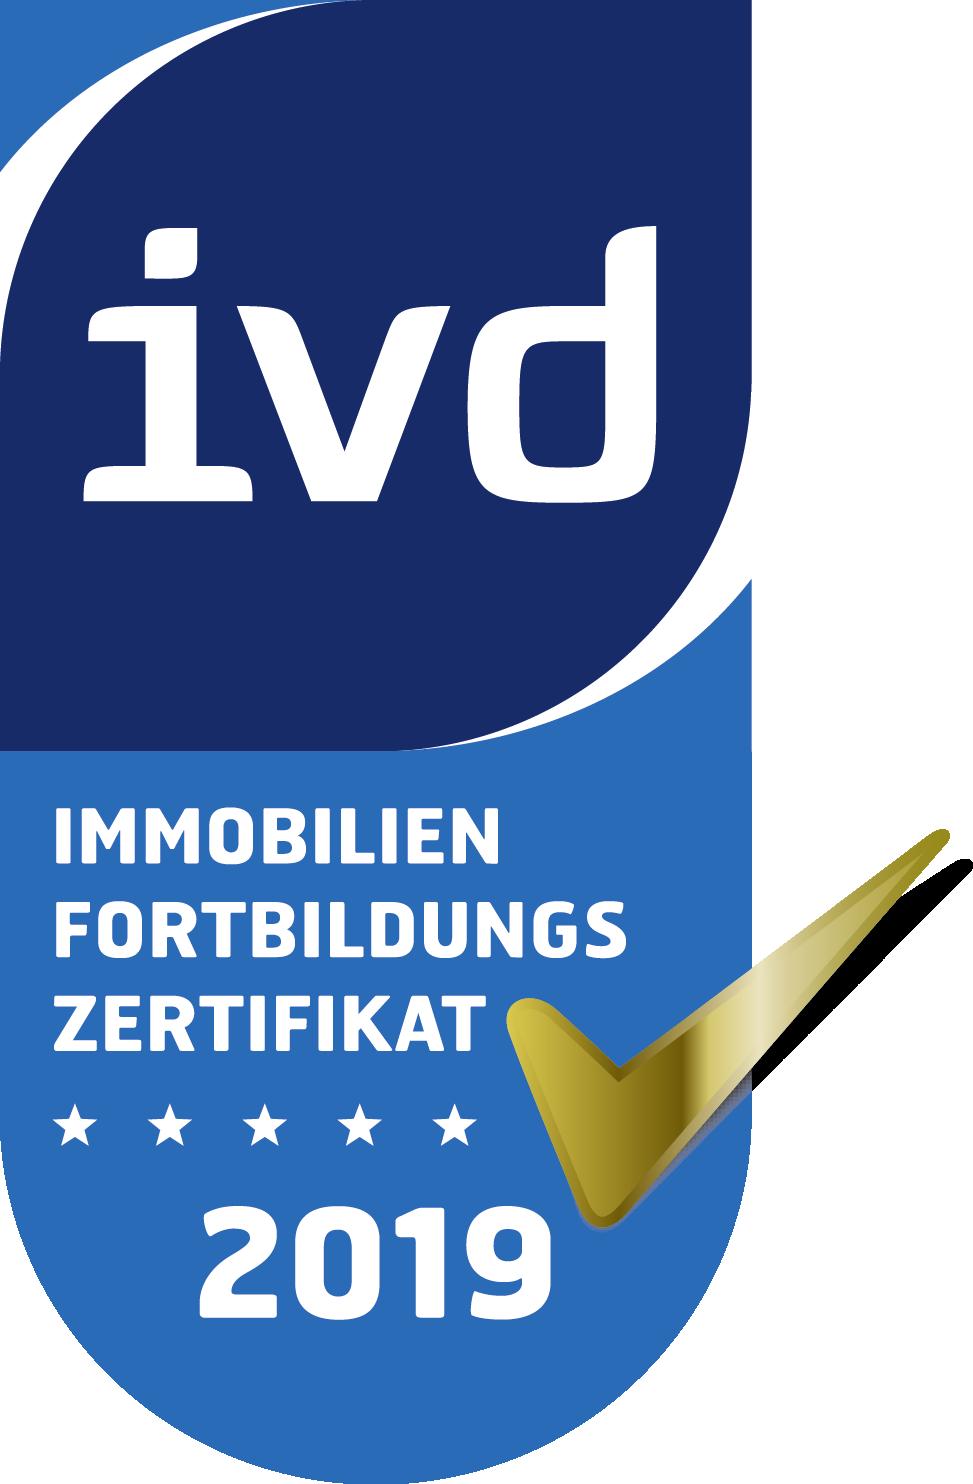 Fortbildungszerfikat vom IVD